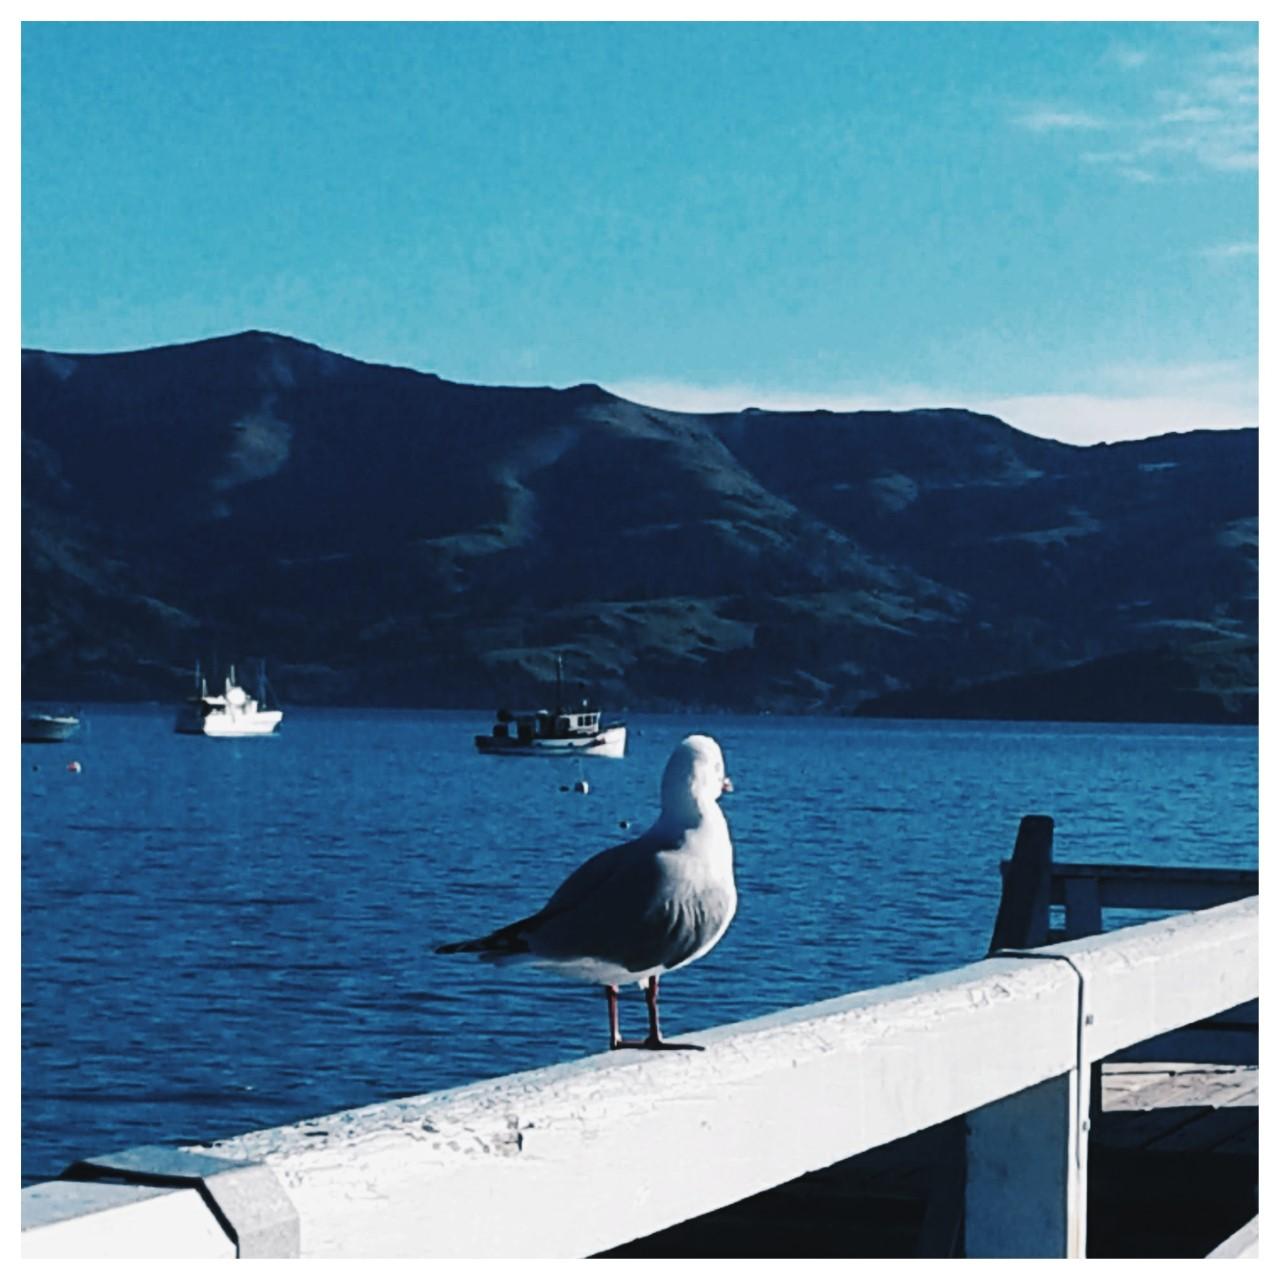 Nouvelles Zélande. (c) Sarah Barreiros.